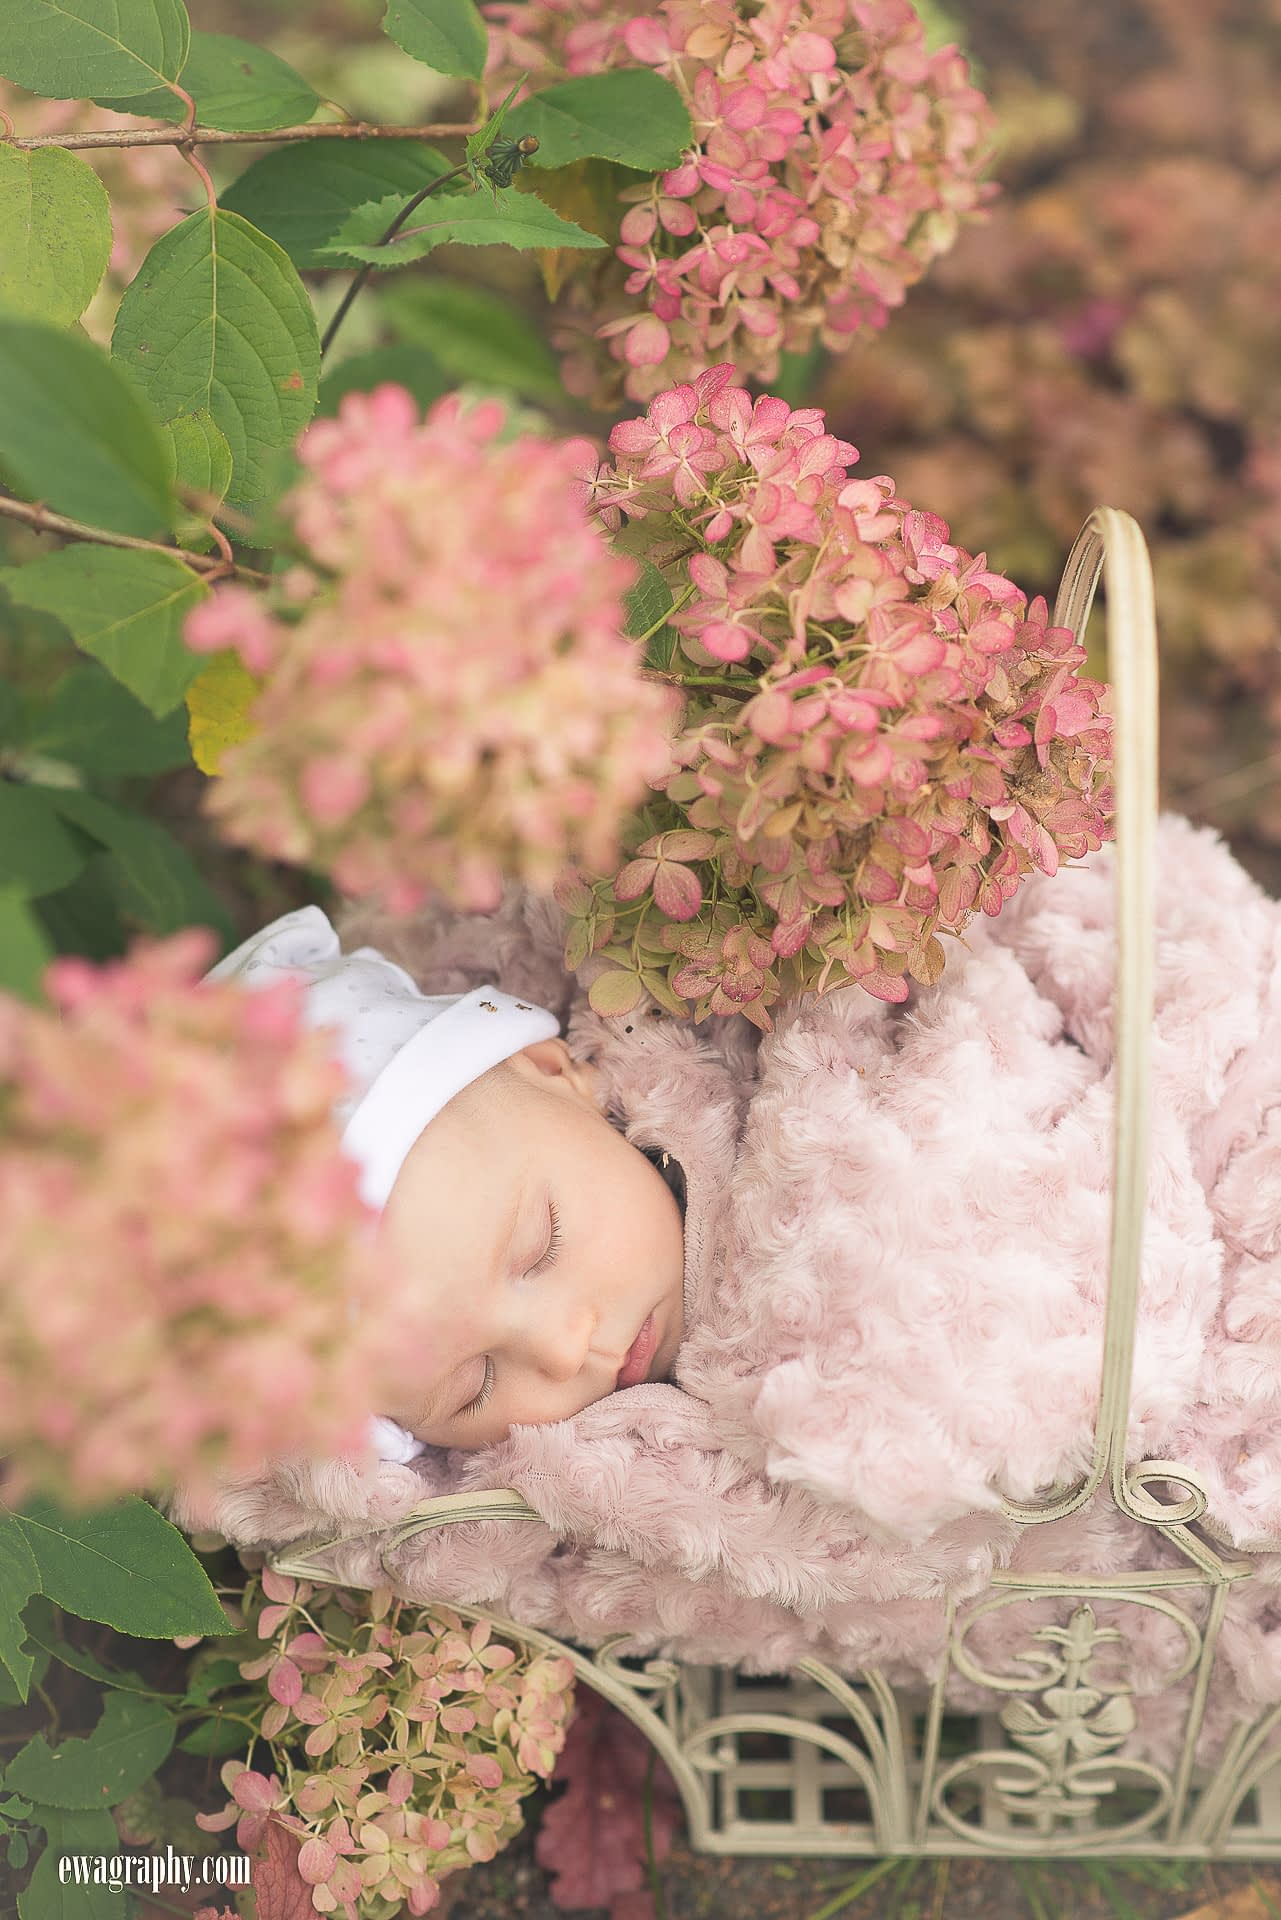 sesja-niemowleca-w-hortensjach-1-of-1